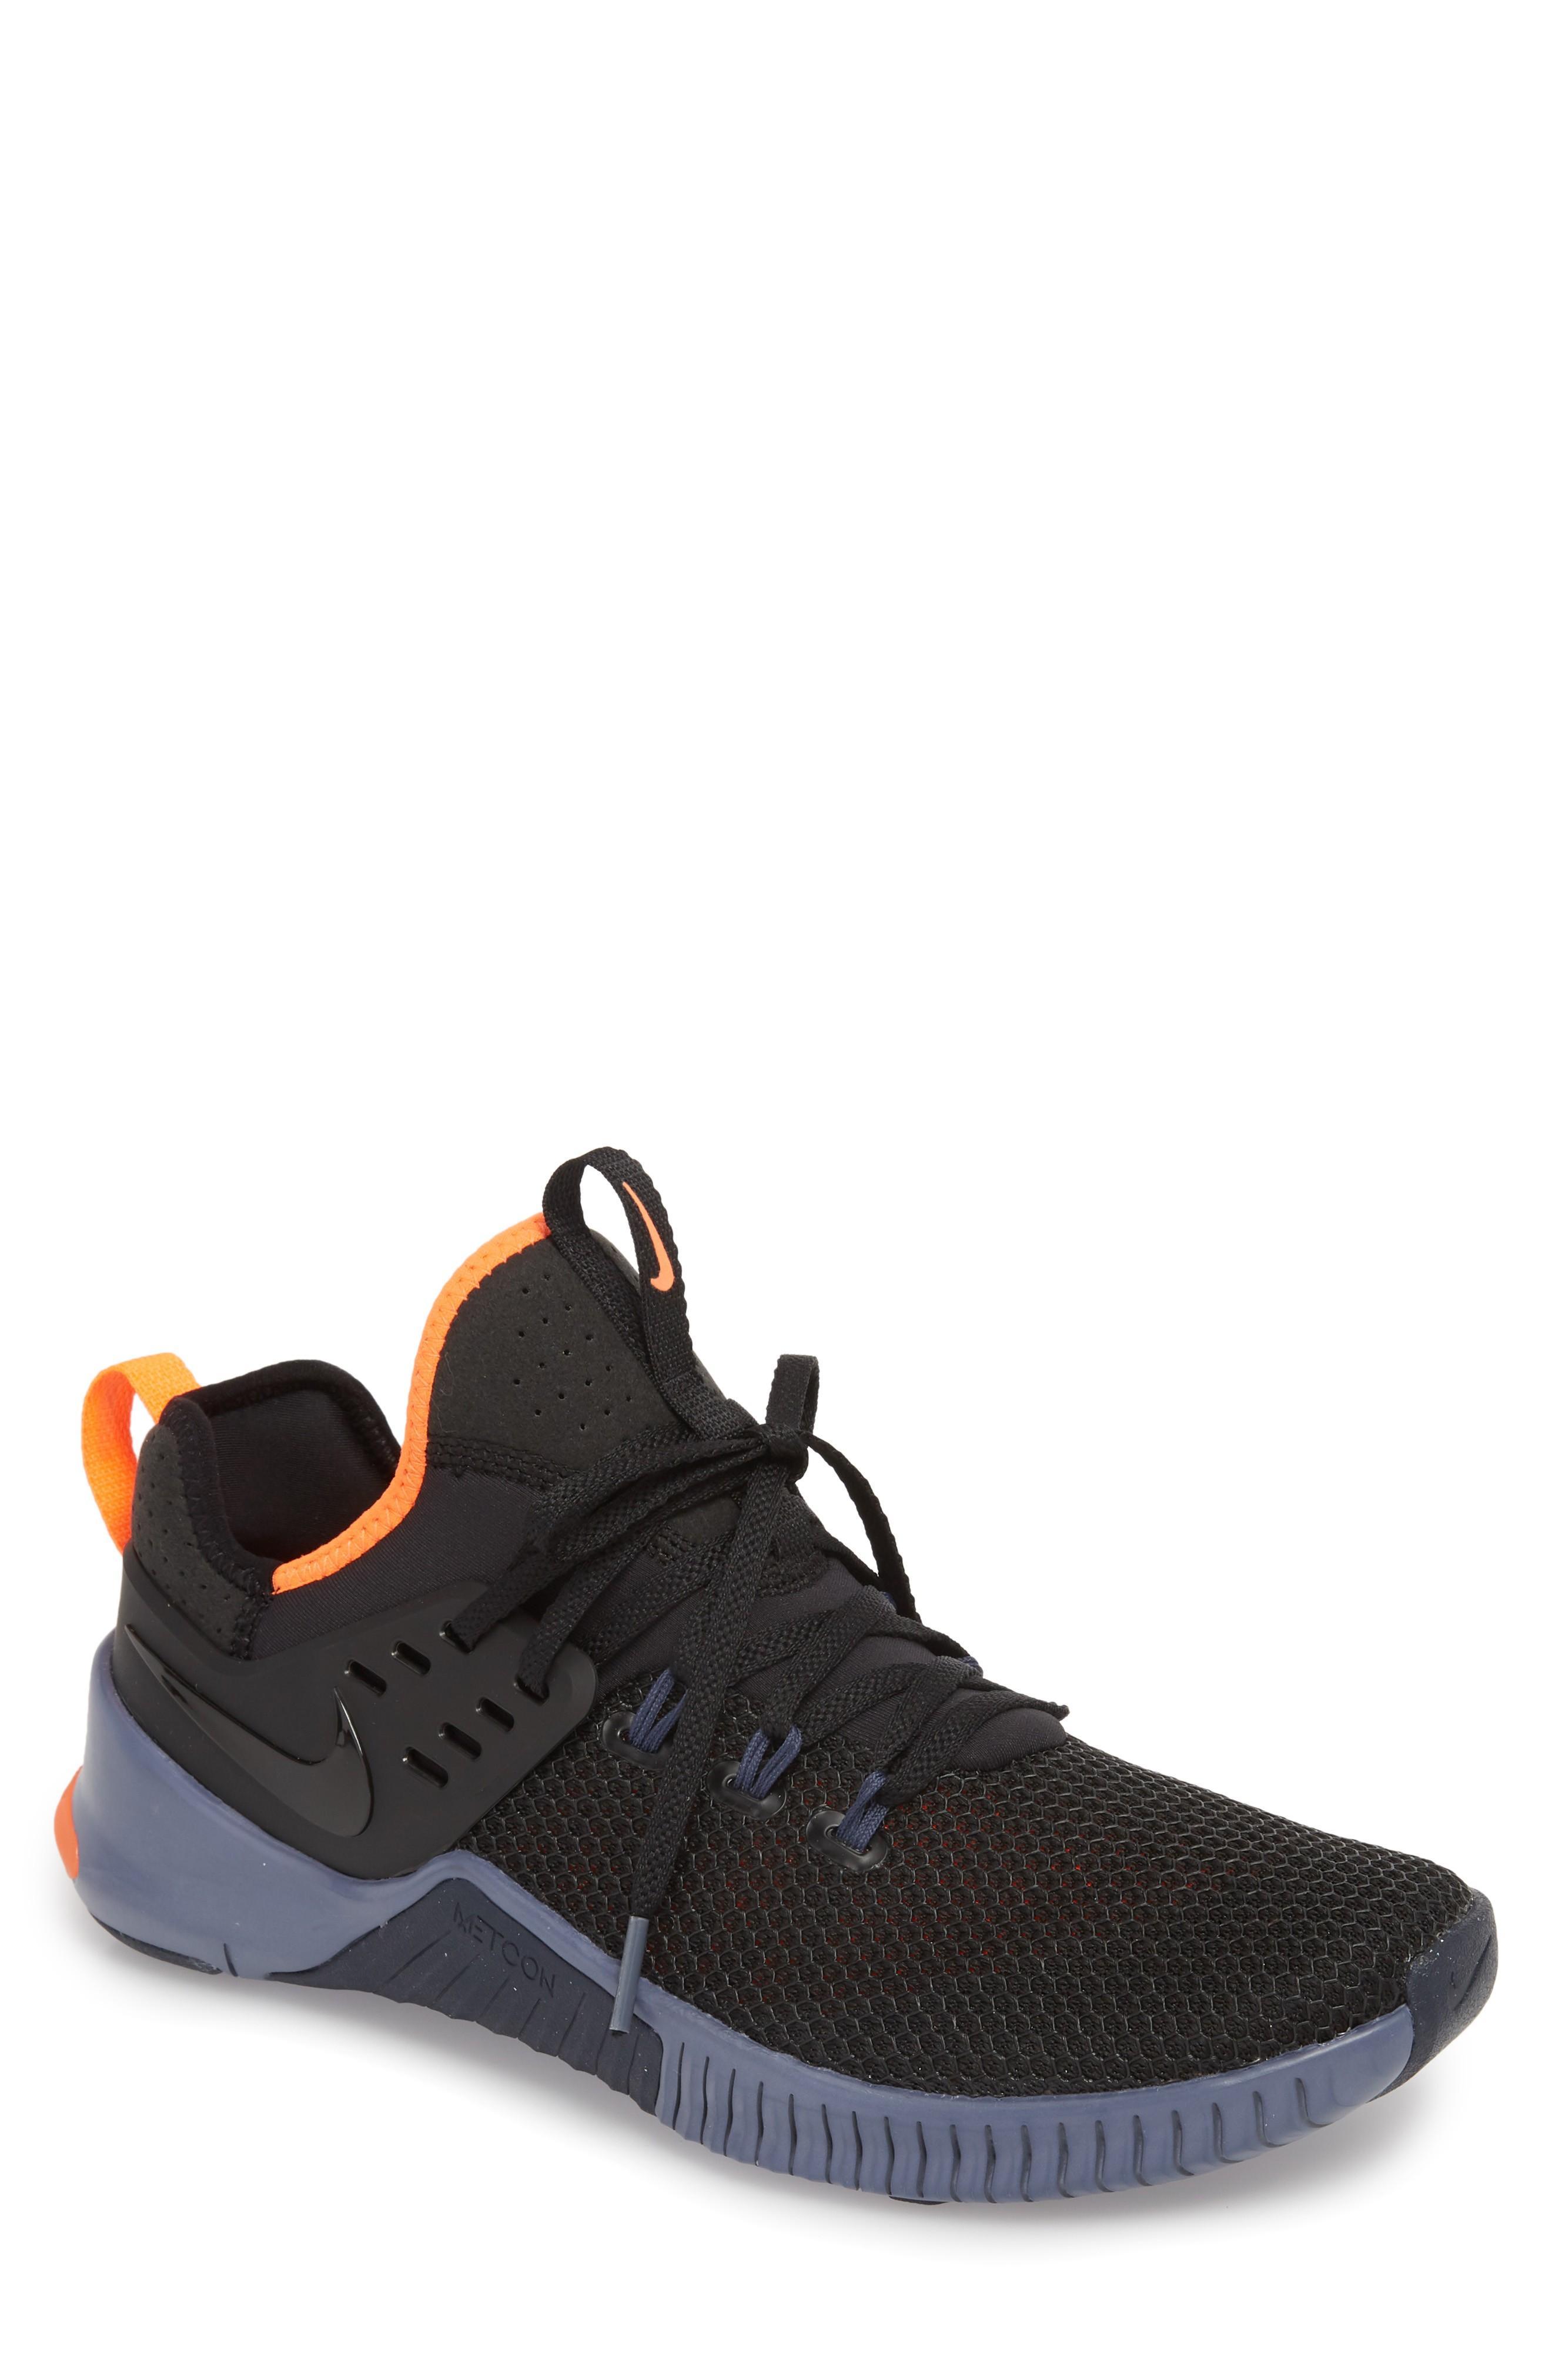 f47220ad2bb5 Nike Free X Metcon Training Shoe In Black  Thunder Blue